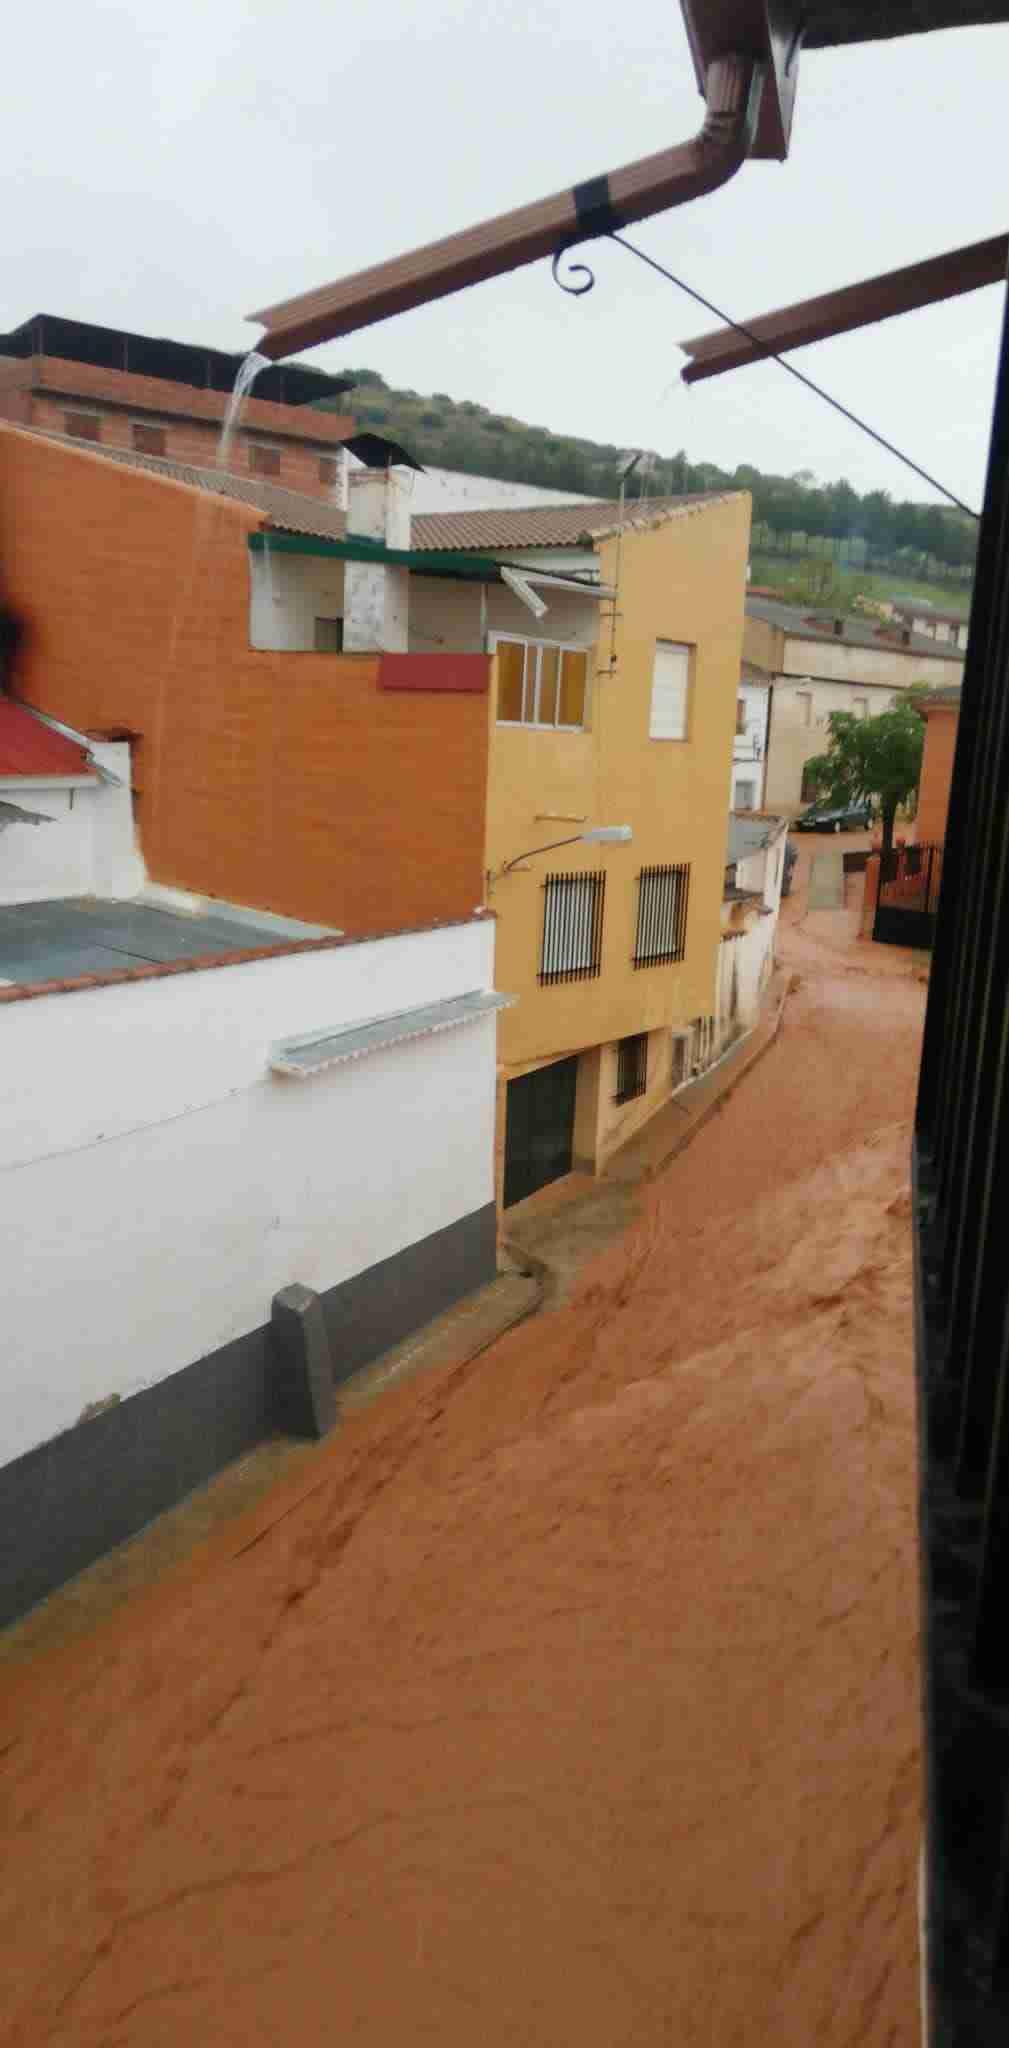 Una fuerte tormenta anegó esta tarde el casco de Carrizosa, donde aguantó el nuevo canal, aunque se desbordó por el fuerte arrastre 6